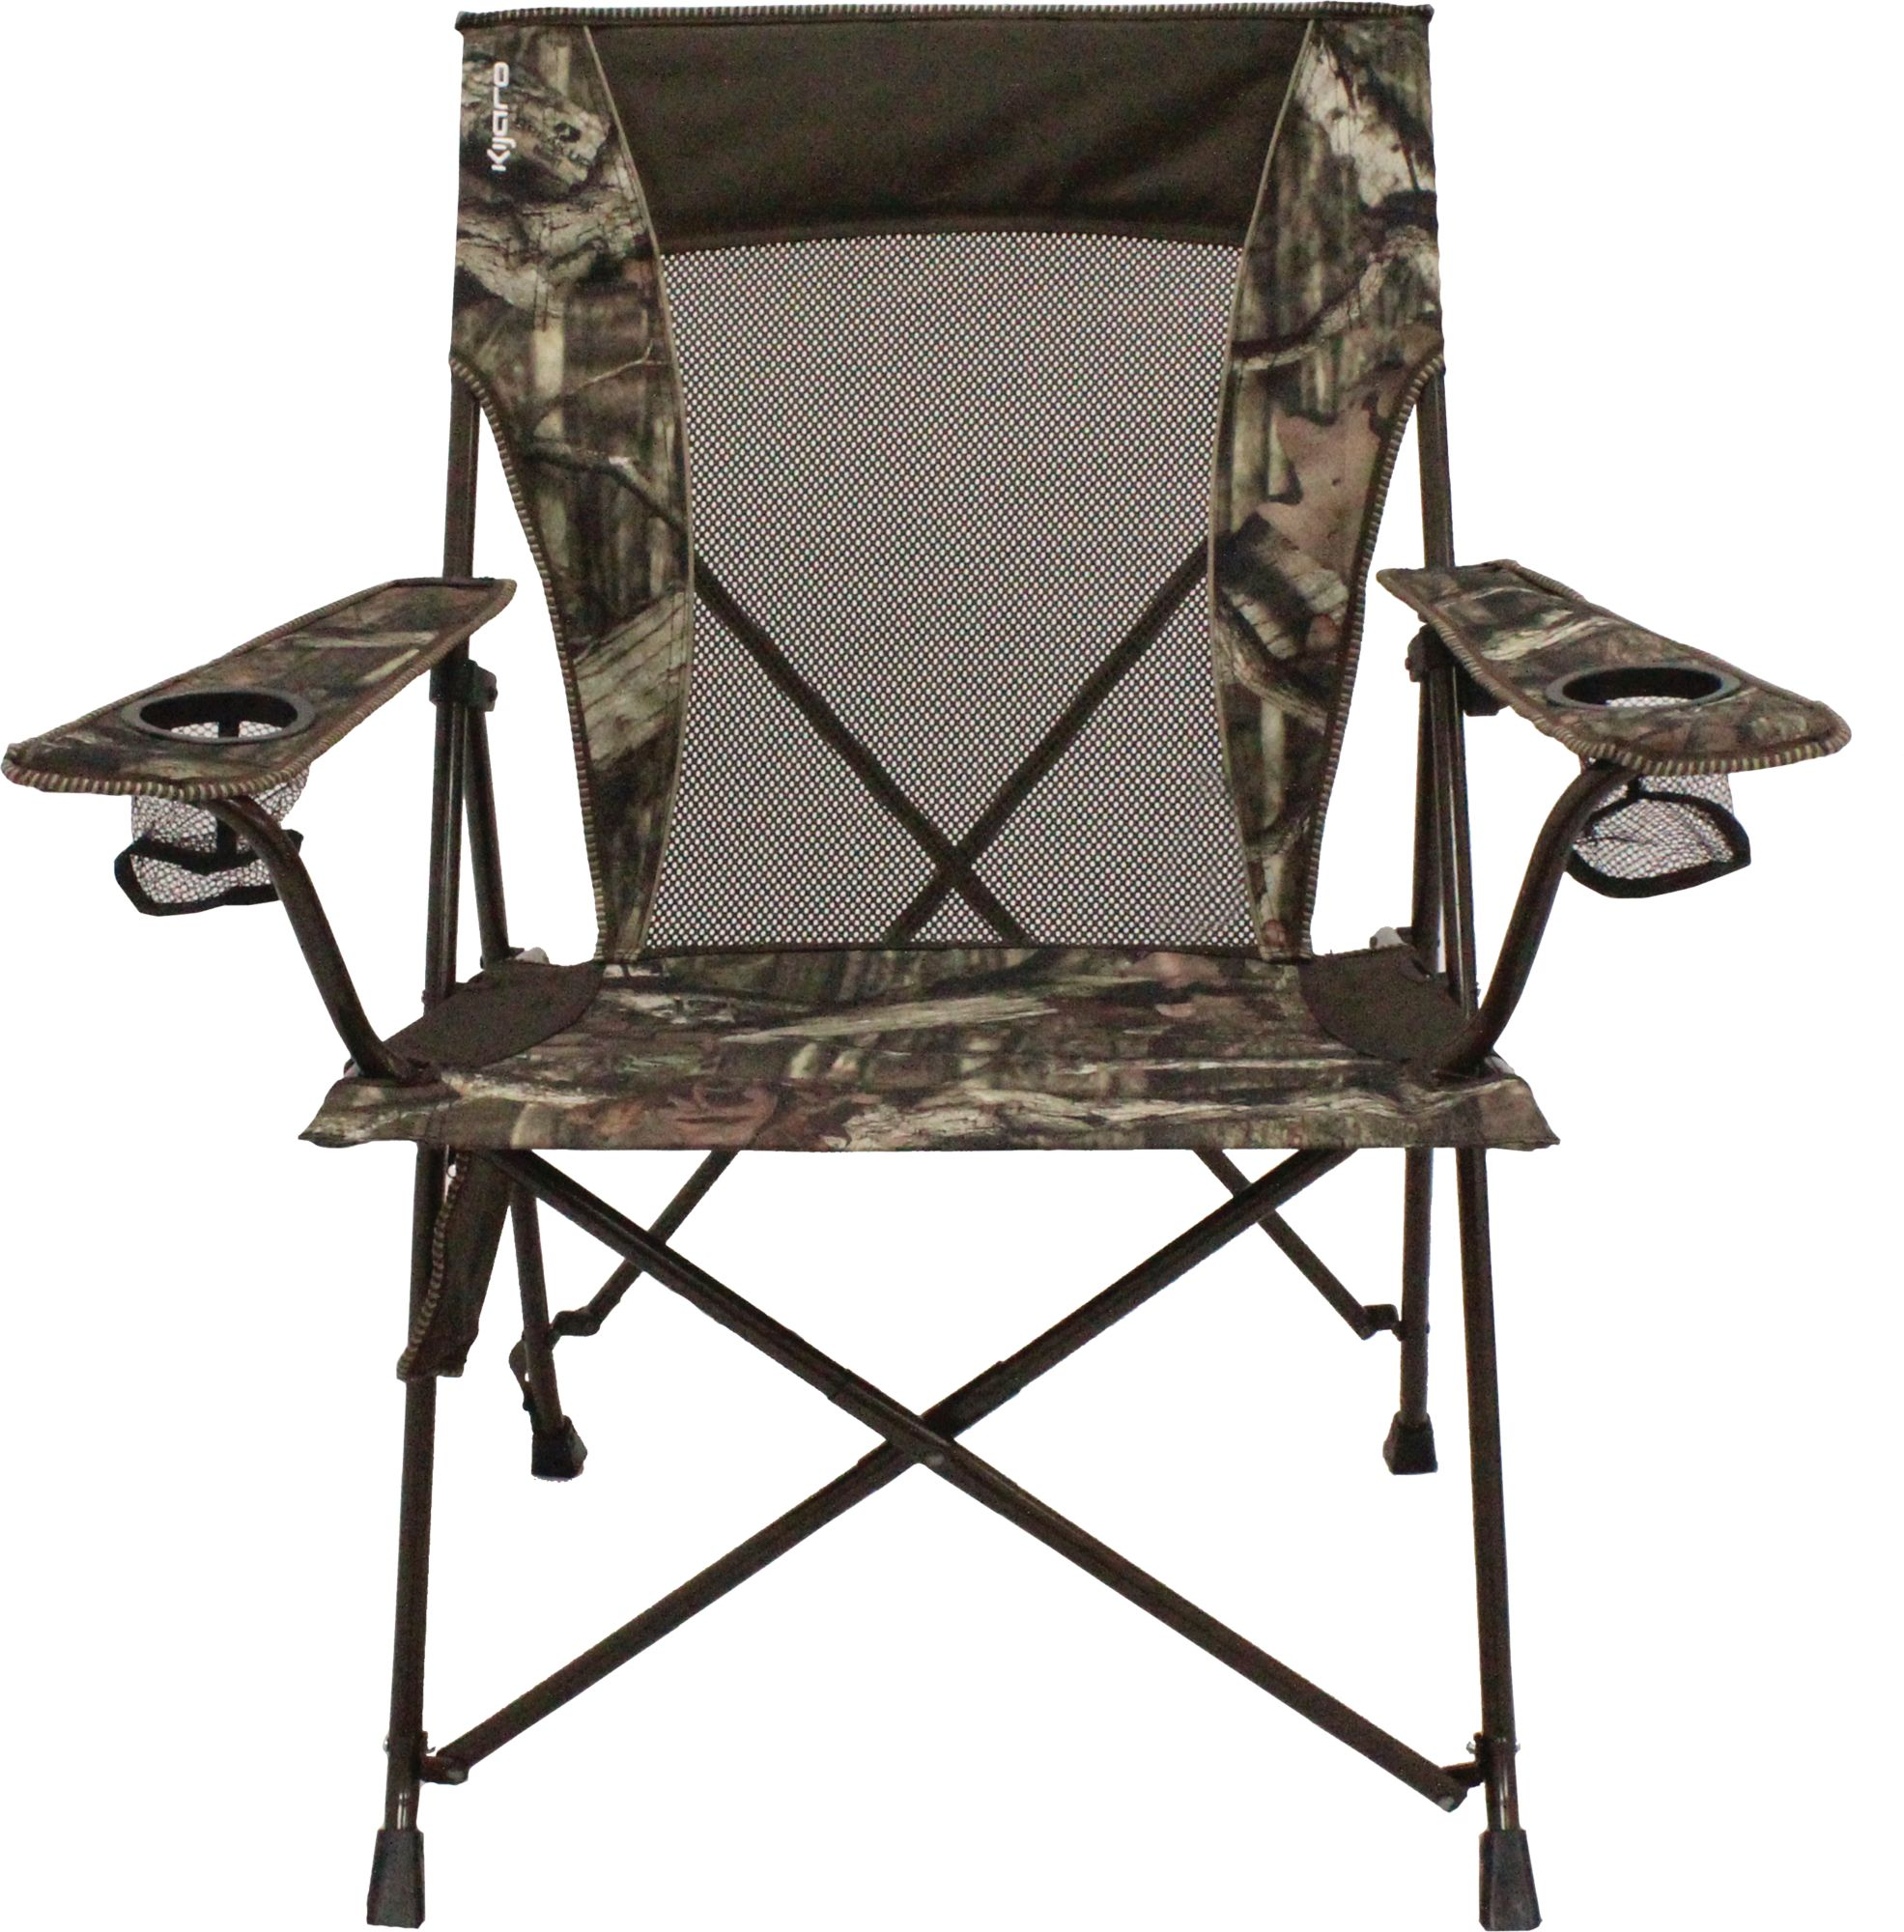 kijaro dual lock folding chair xxl swing in stand patio chairs | dick's sporting goods